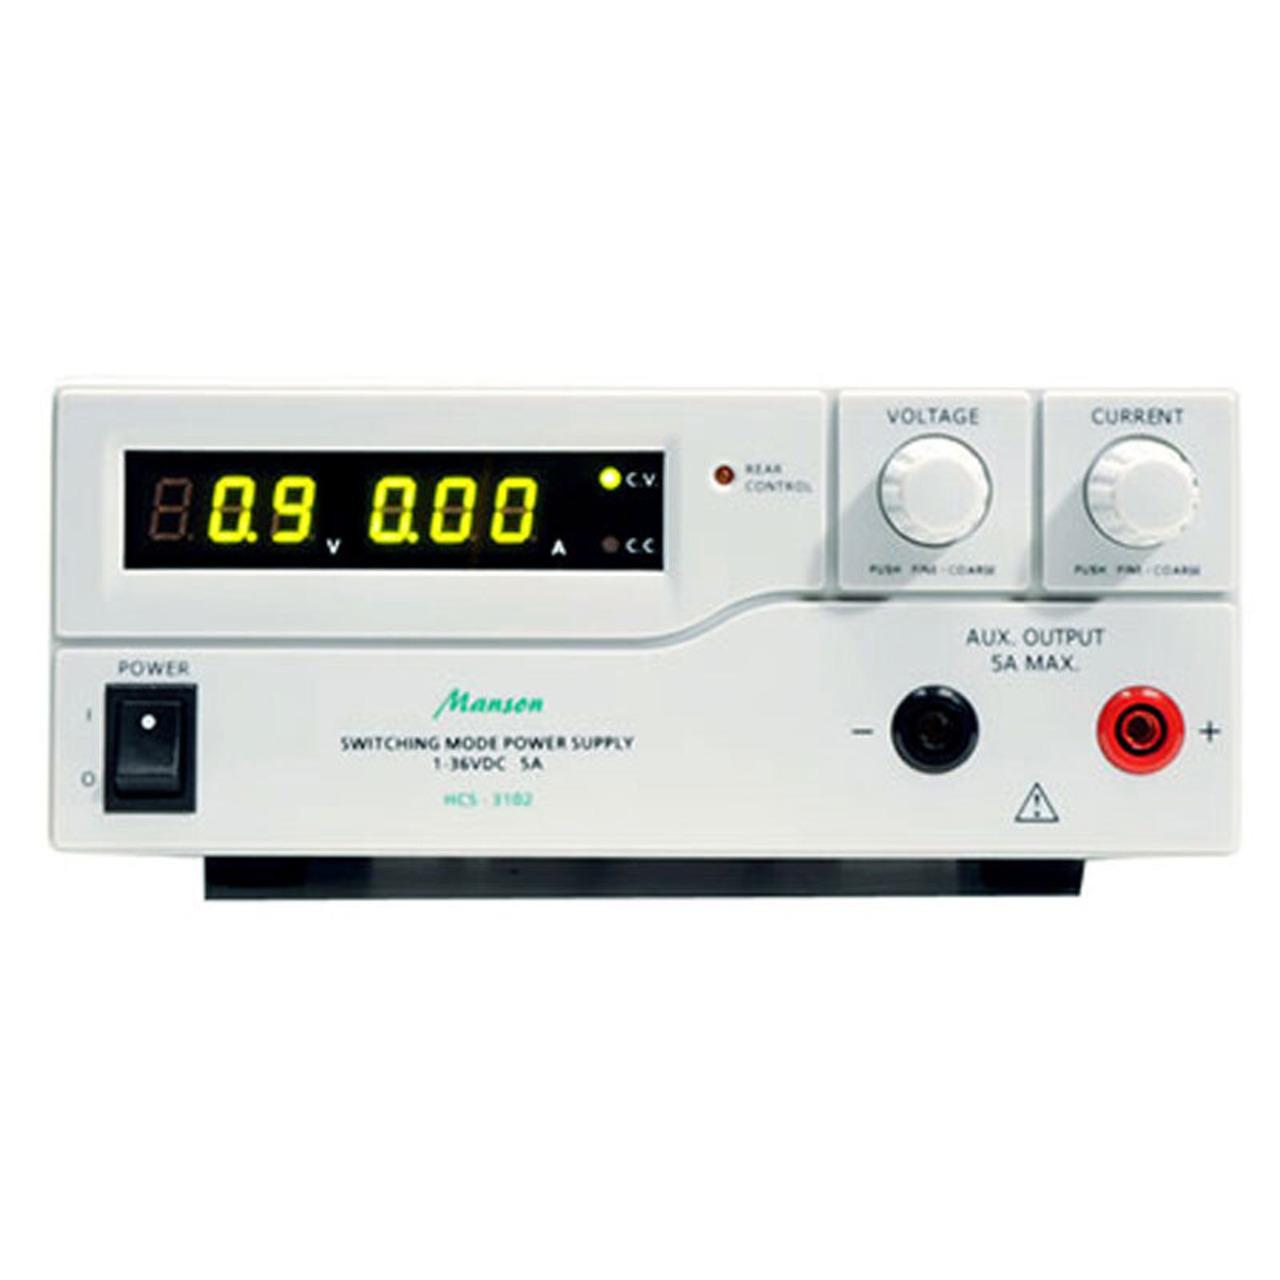 Manson Labornetzgerät HCS-3102 (1-36 V-0-5 A) mit USB-Schnittstelle- programmierbar